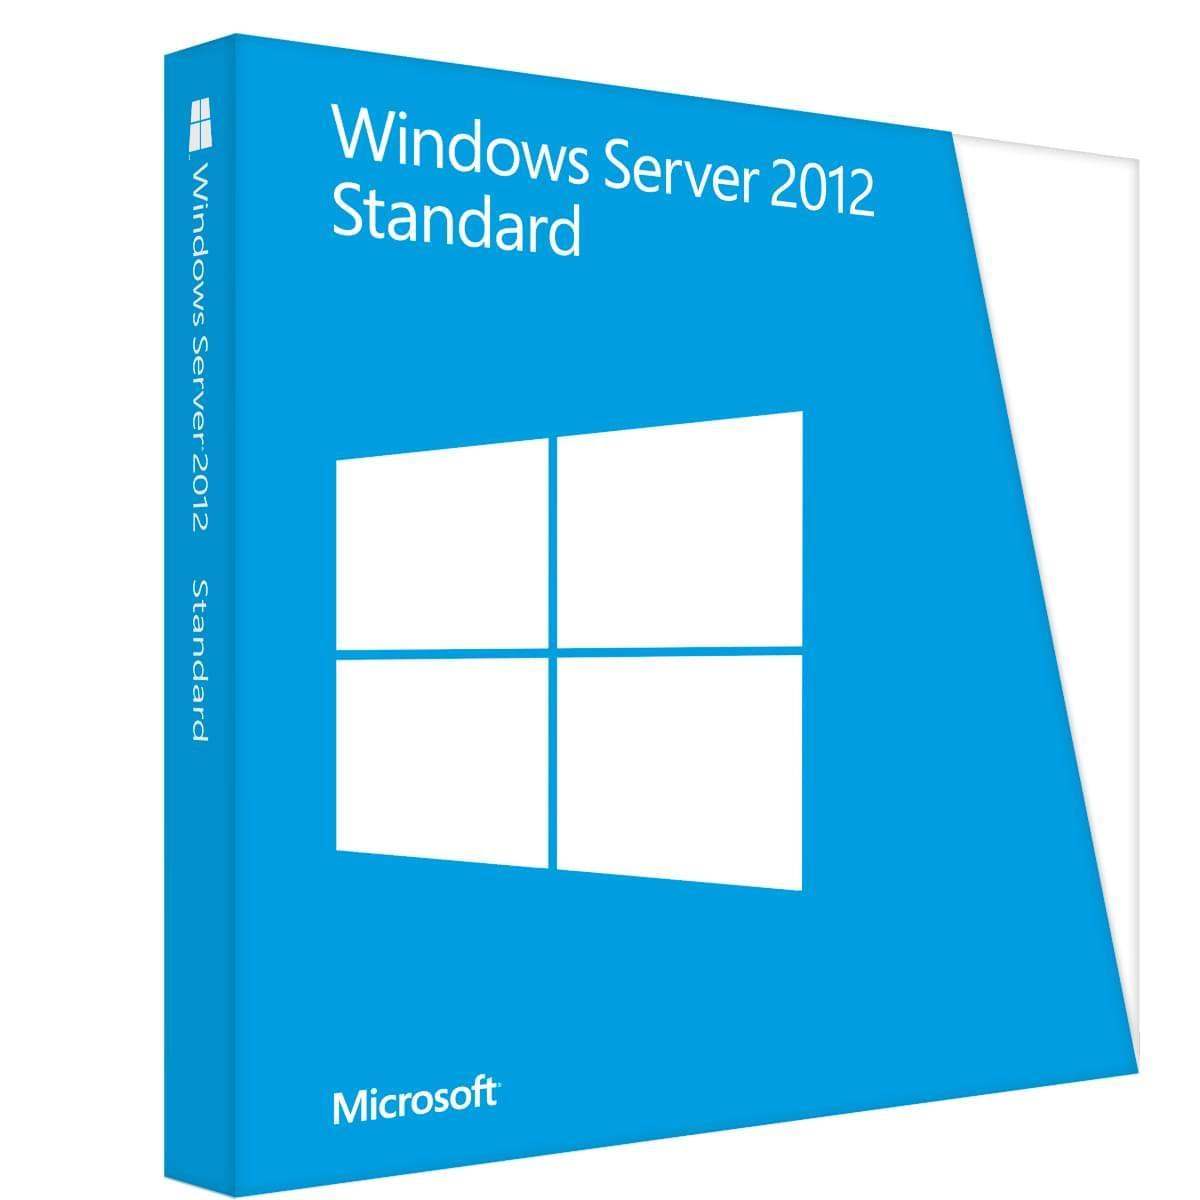 Microsoft CAL Device Windows Server 2012 Standard DUST - Logiciel système exploitation - 0